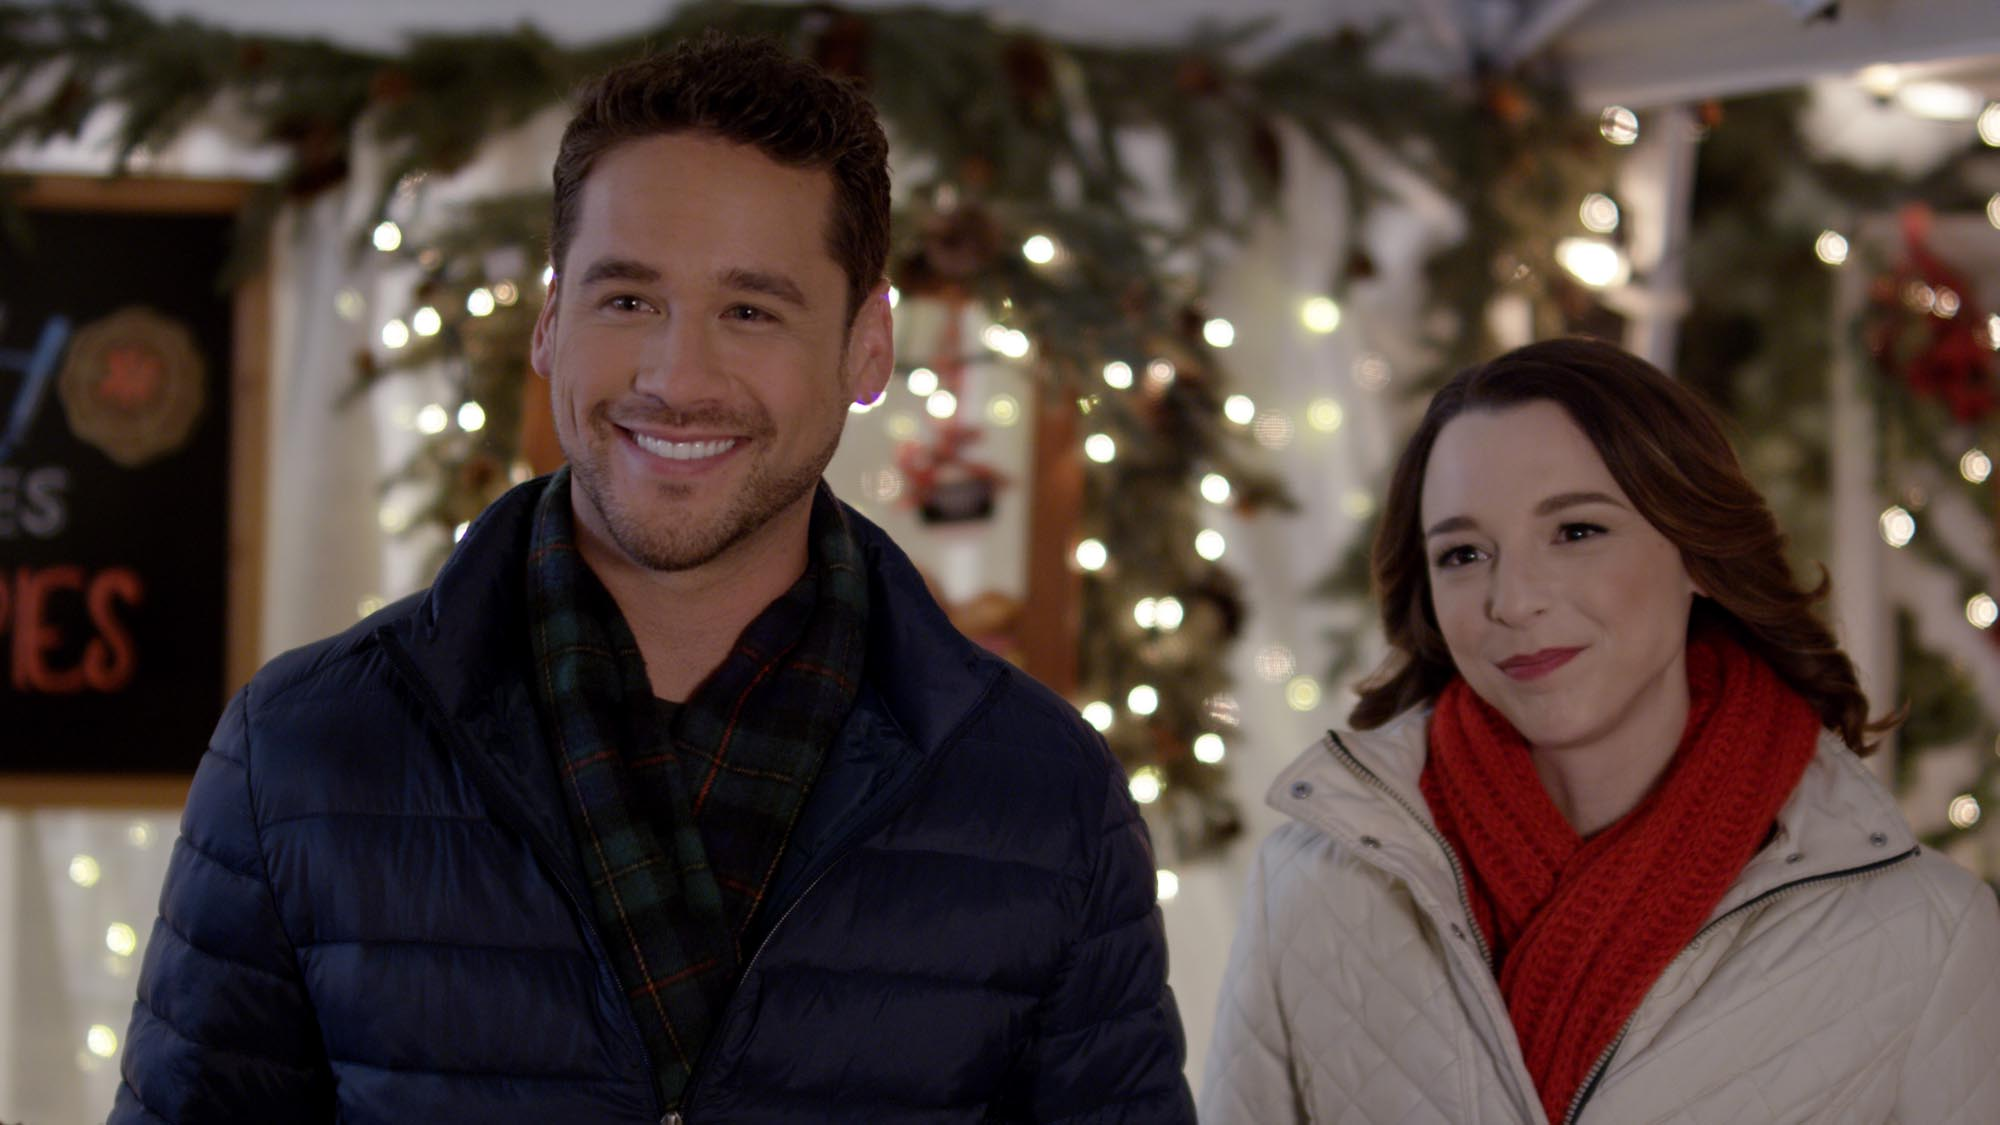 2021 Lifetime Christmas Movies- Hot Chocolate Holiday